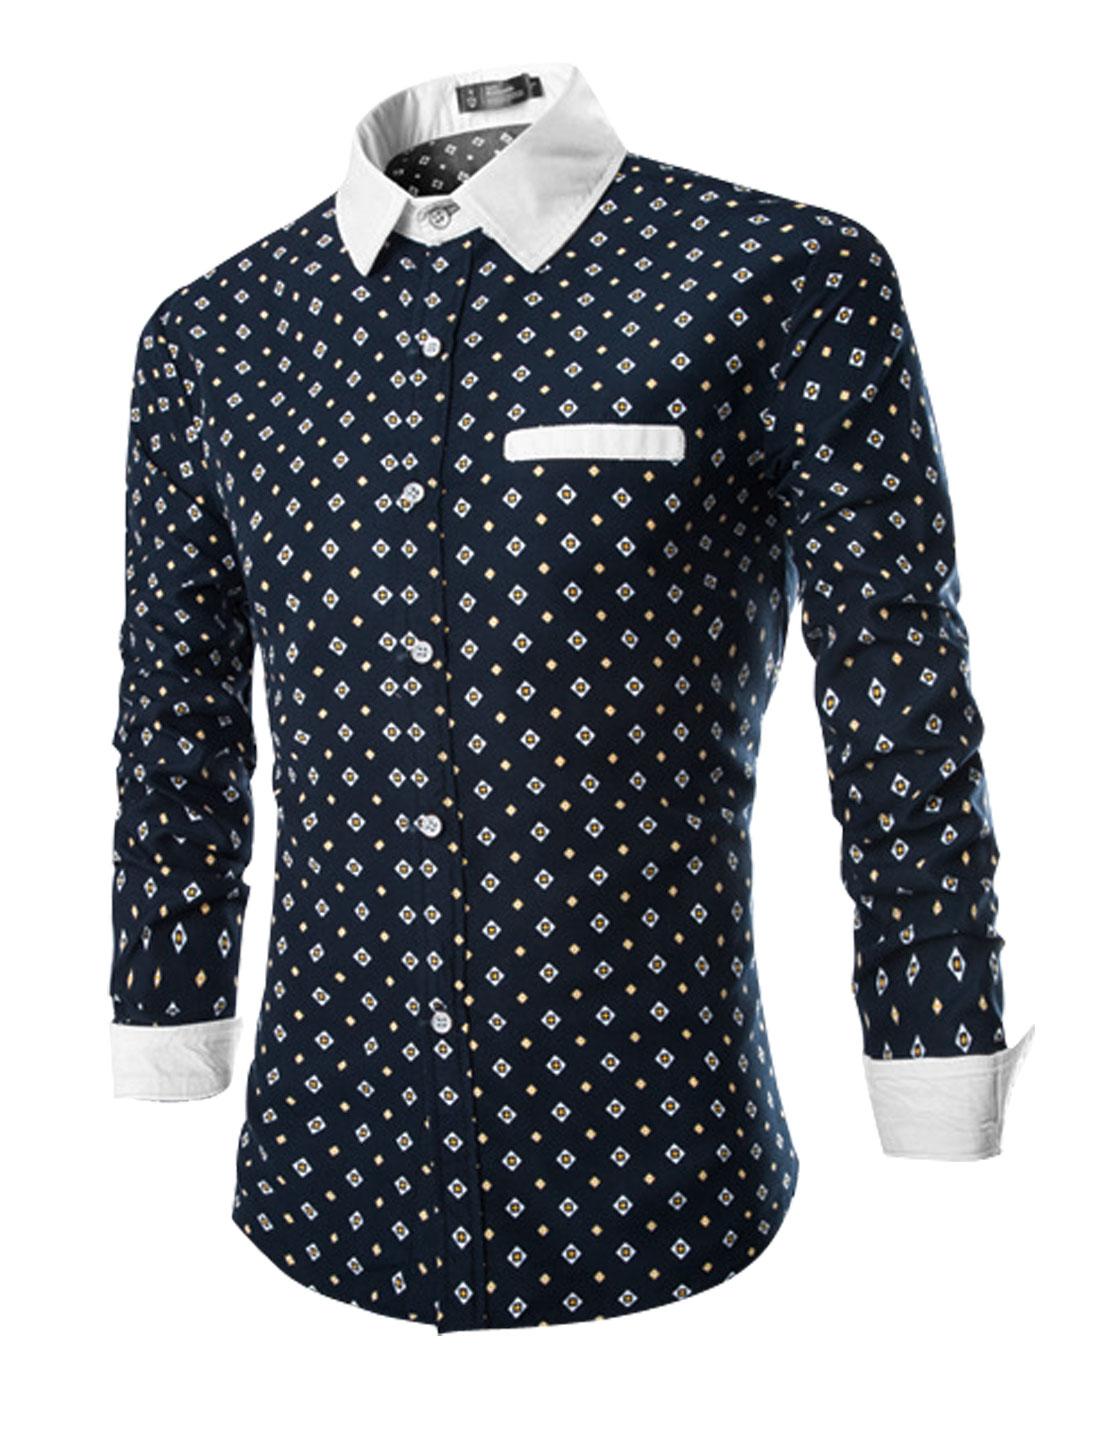 Men Point Collar Long Sleeves Geometric Printed Casual Shirts Navy Blue M